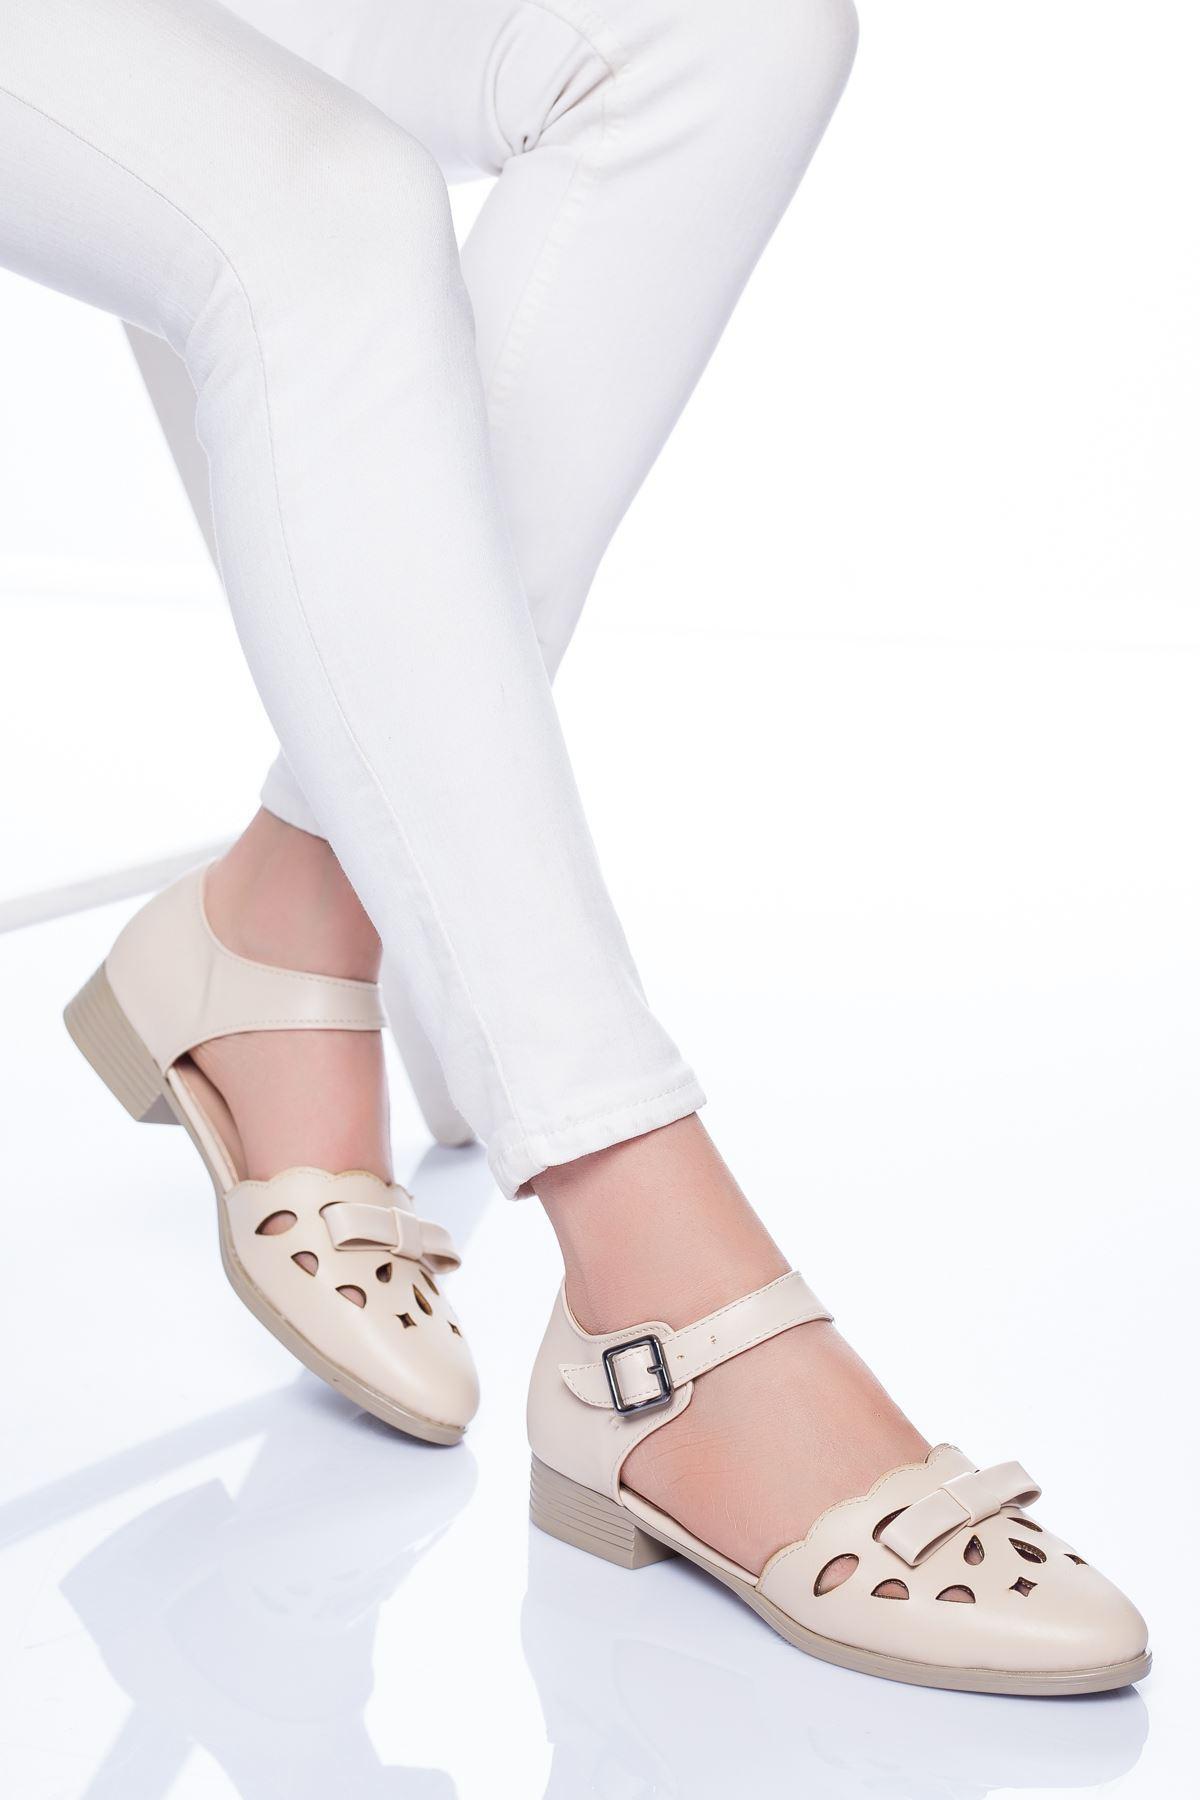 Jones Babet Ayakkabı TEN